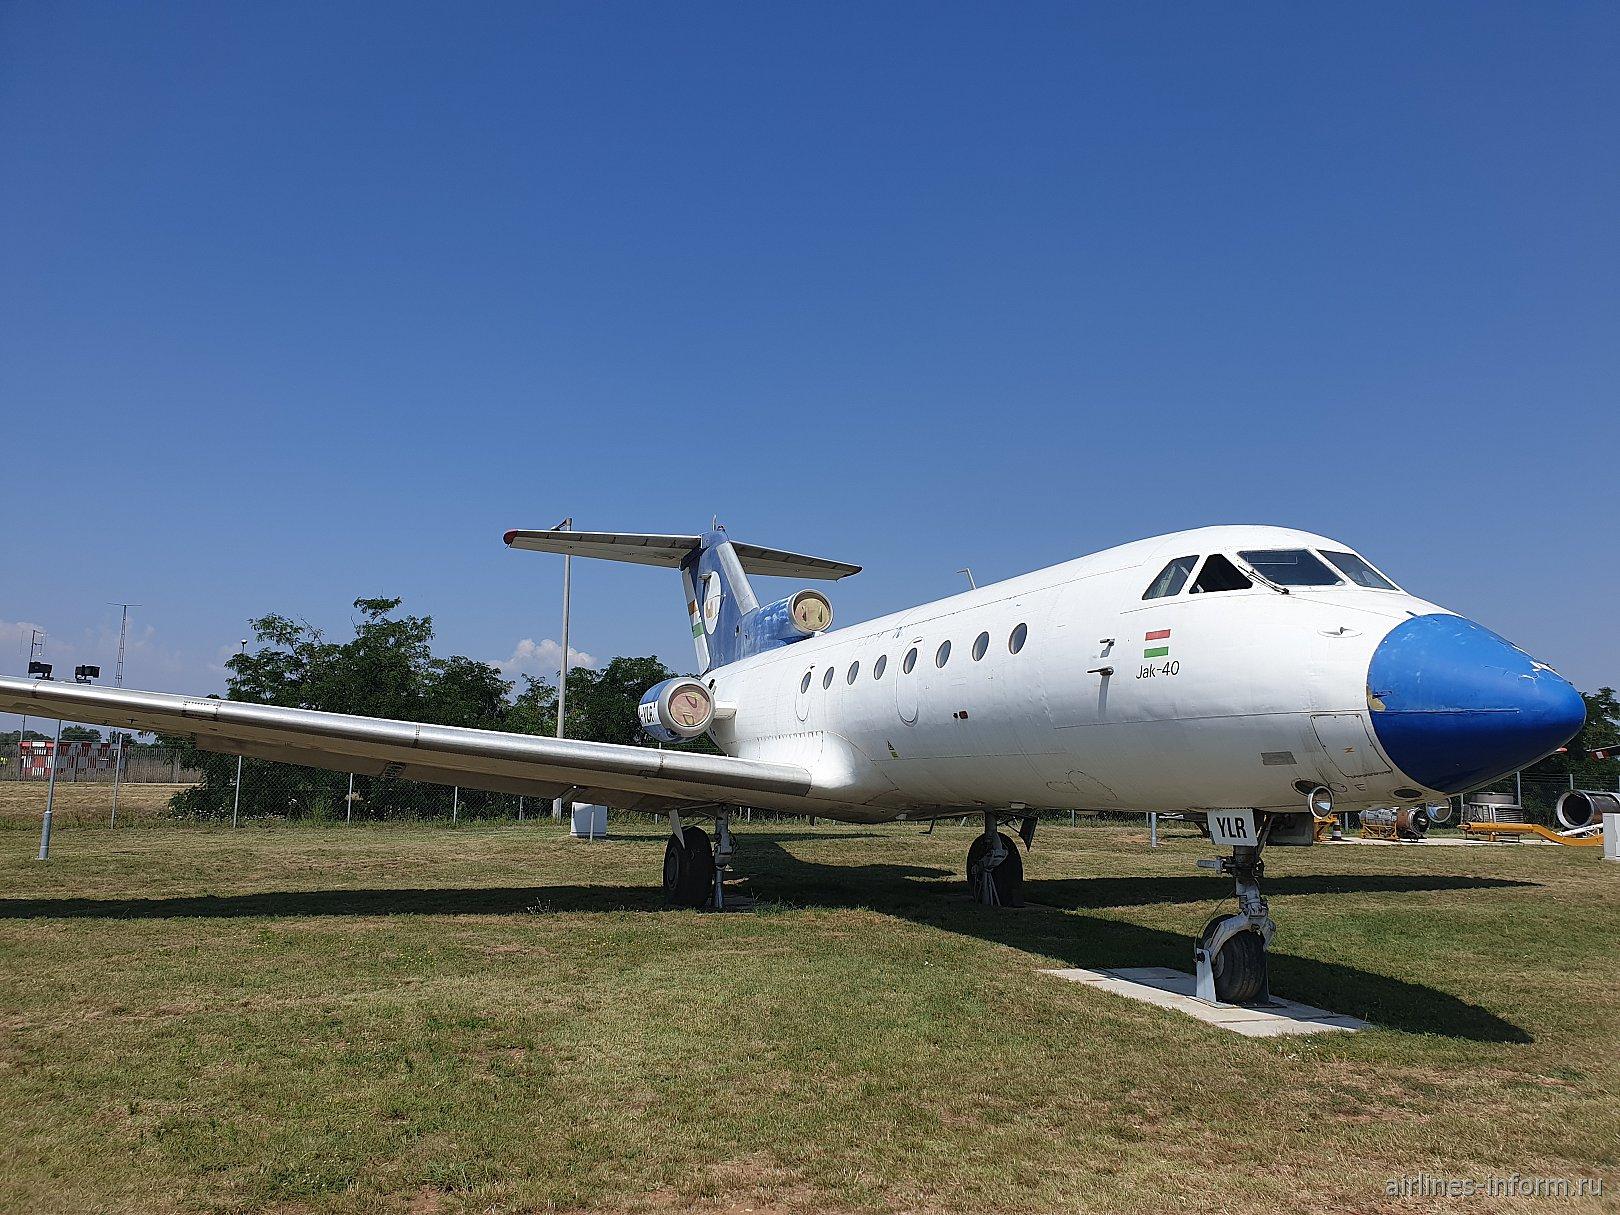 Самолет Як-40 HA-YLR авиакомпании Malev в музее аэропорта Будапешта